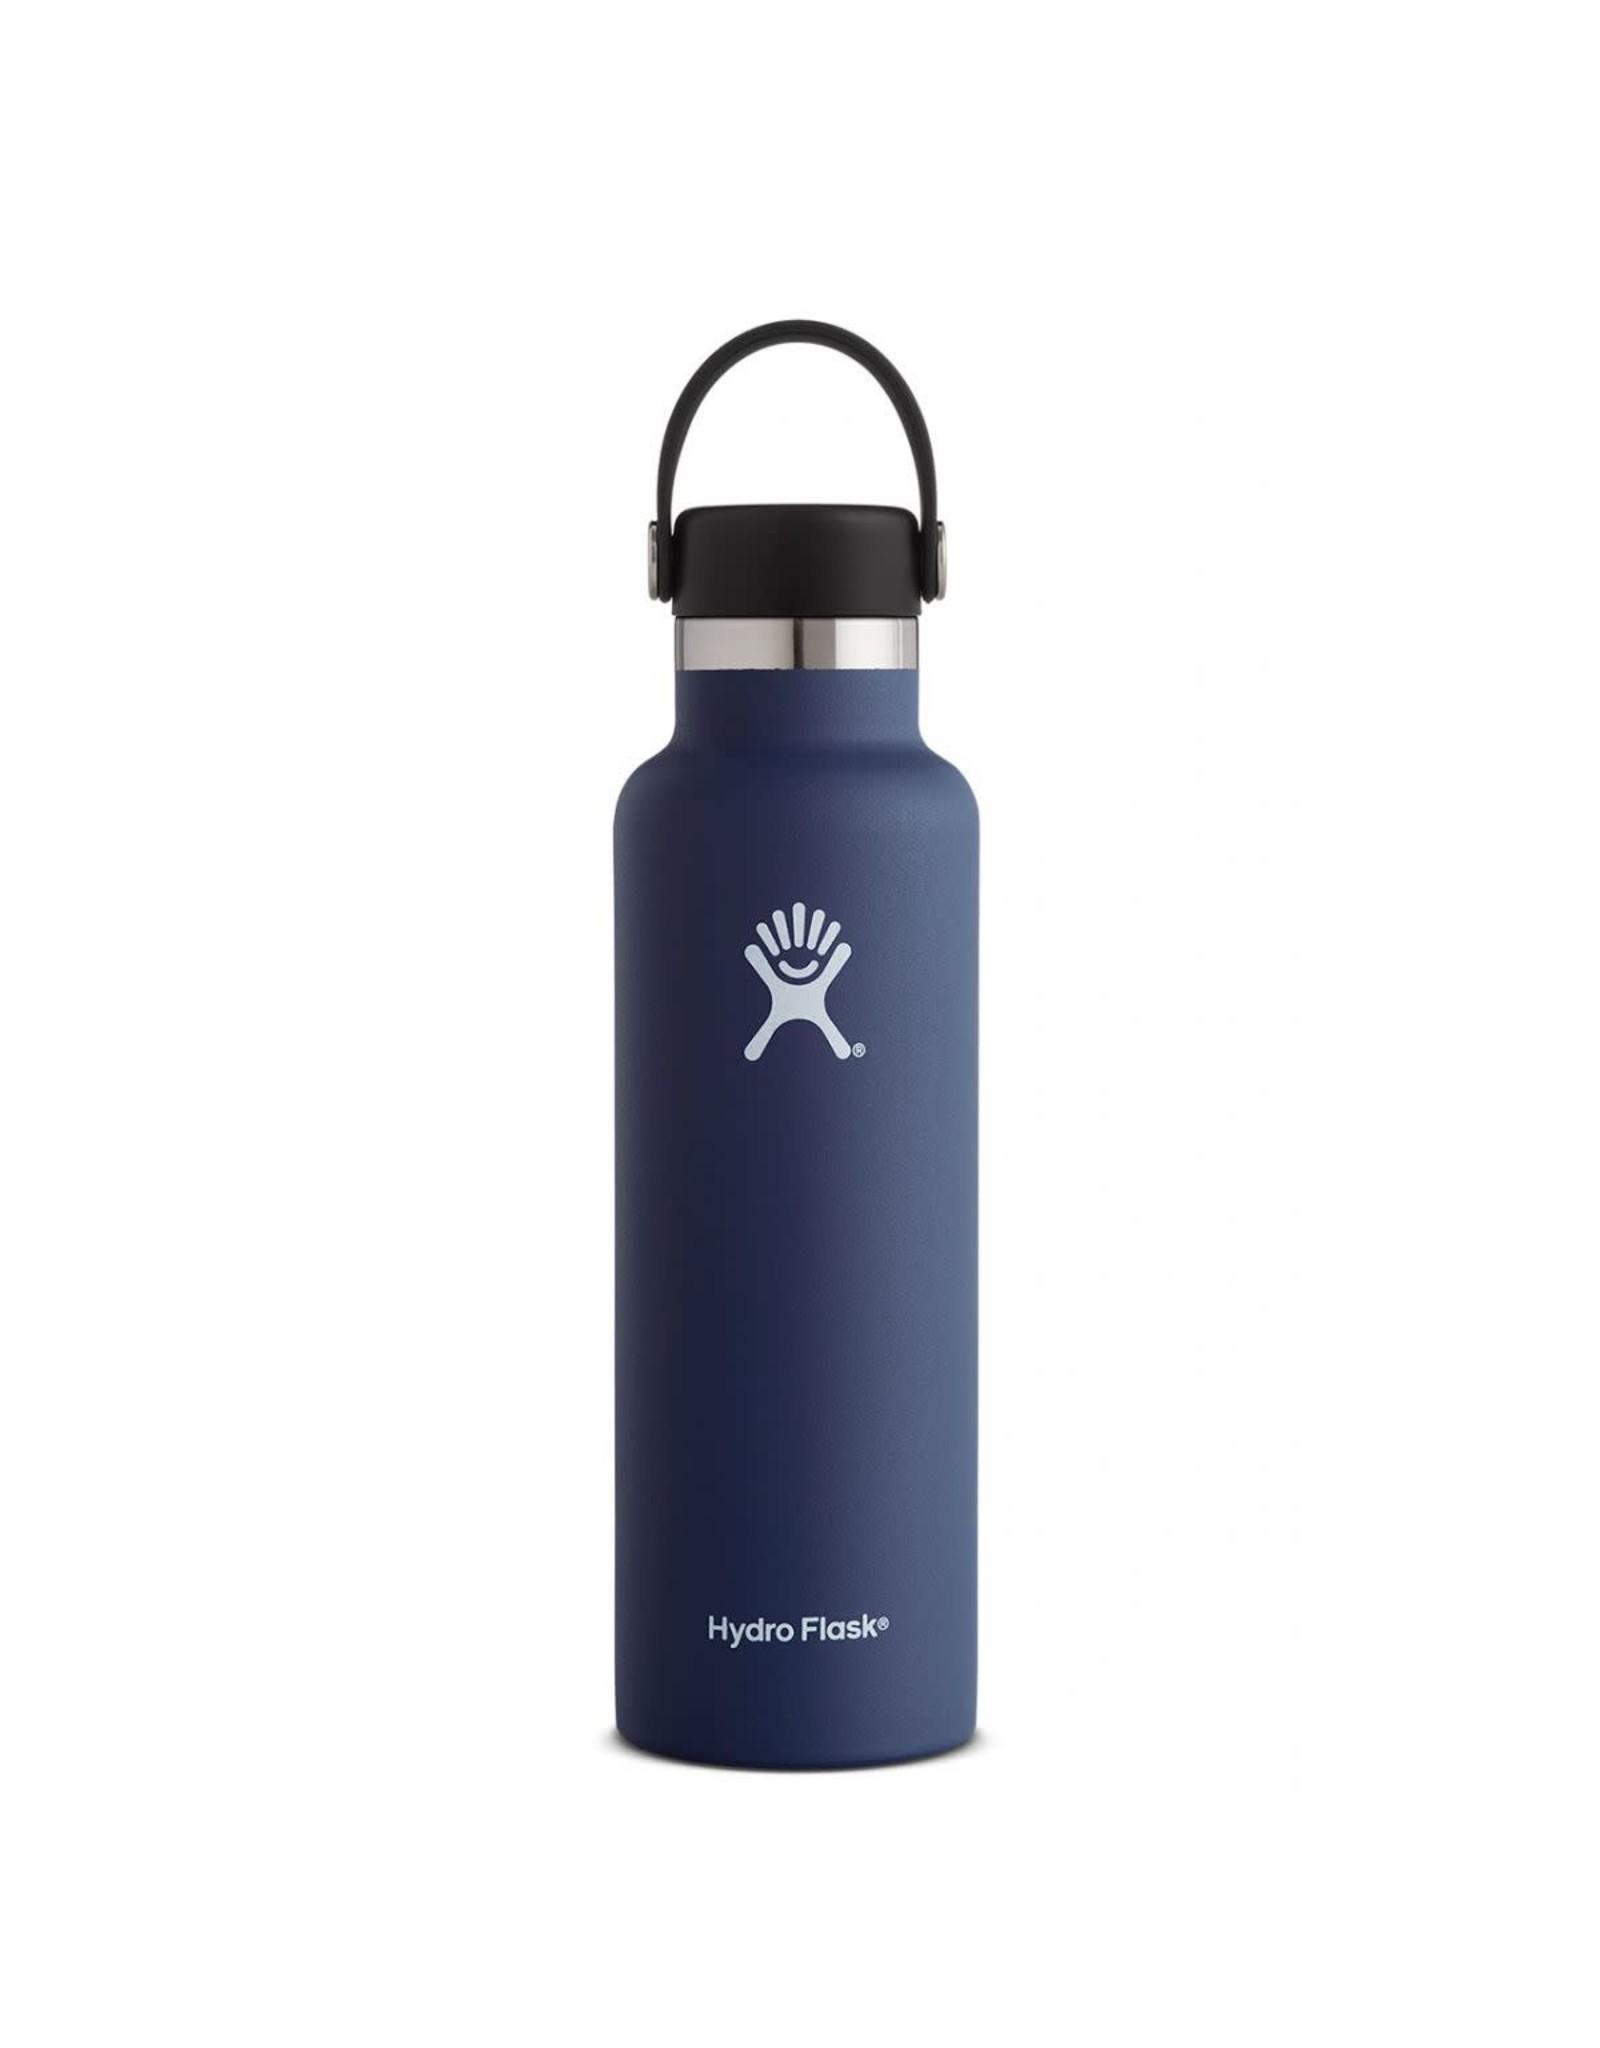 HYDRO FLASK HYDRO FLASK 21 oz STANDARD MOUTH FLEX CAP